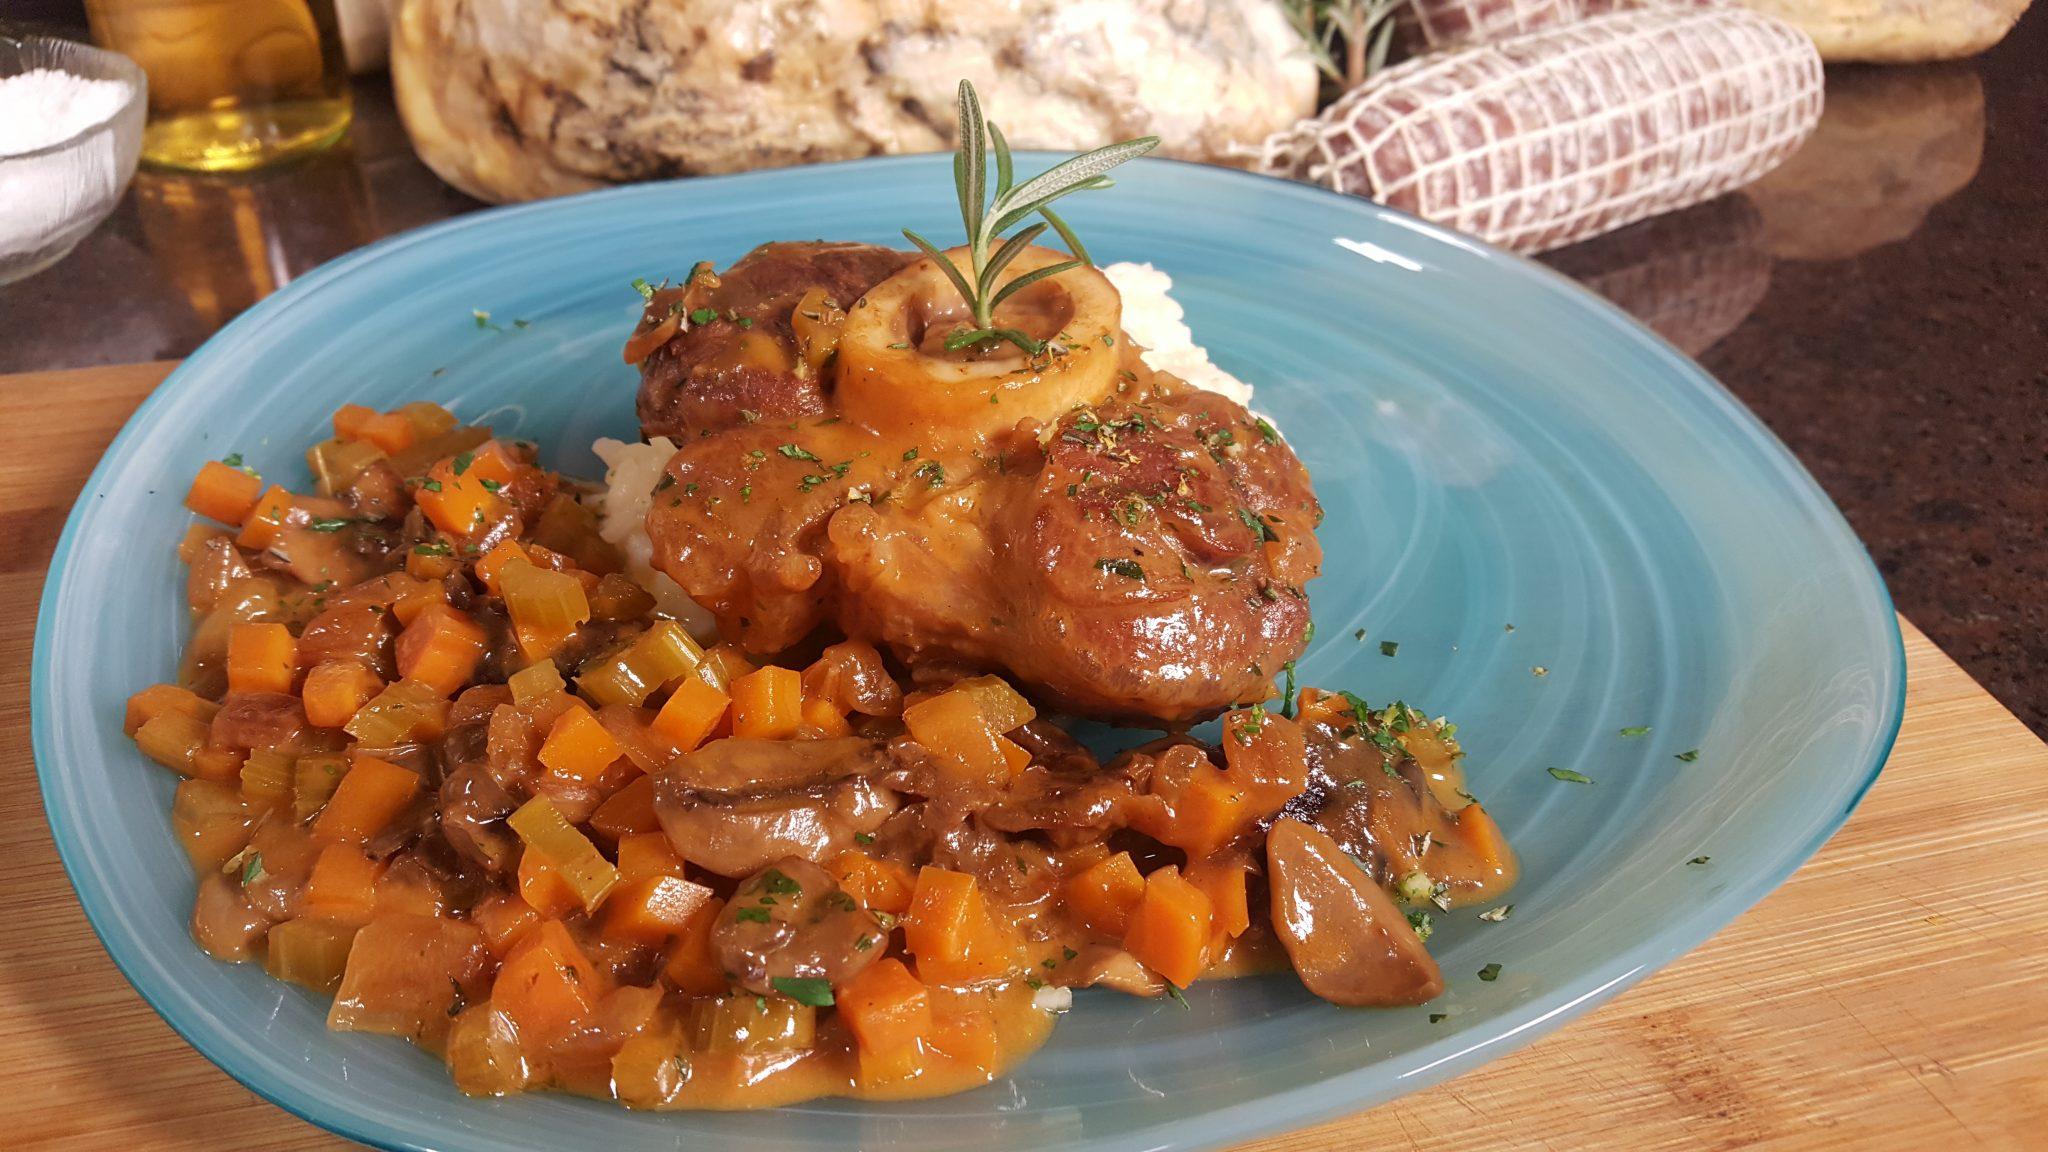 Recipes omni on en for Cucinare ossobuco